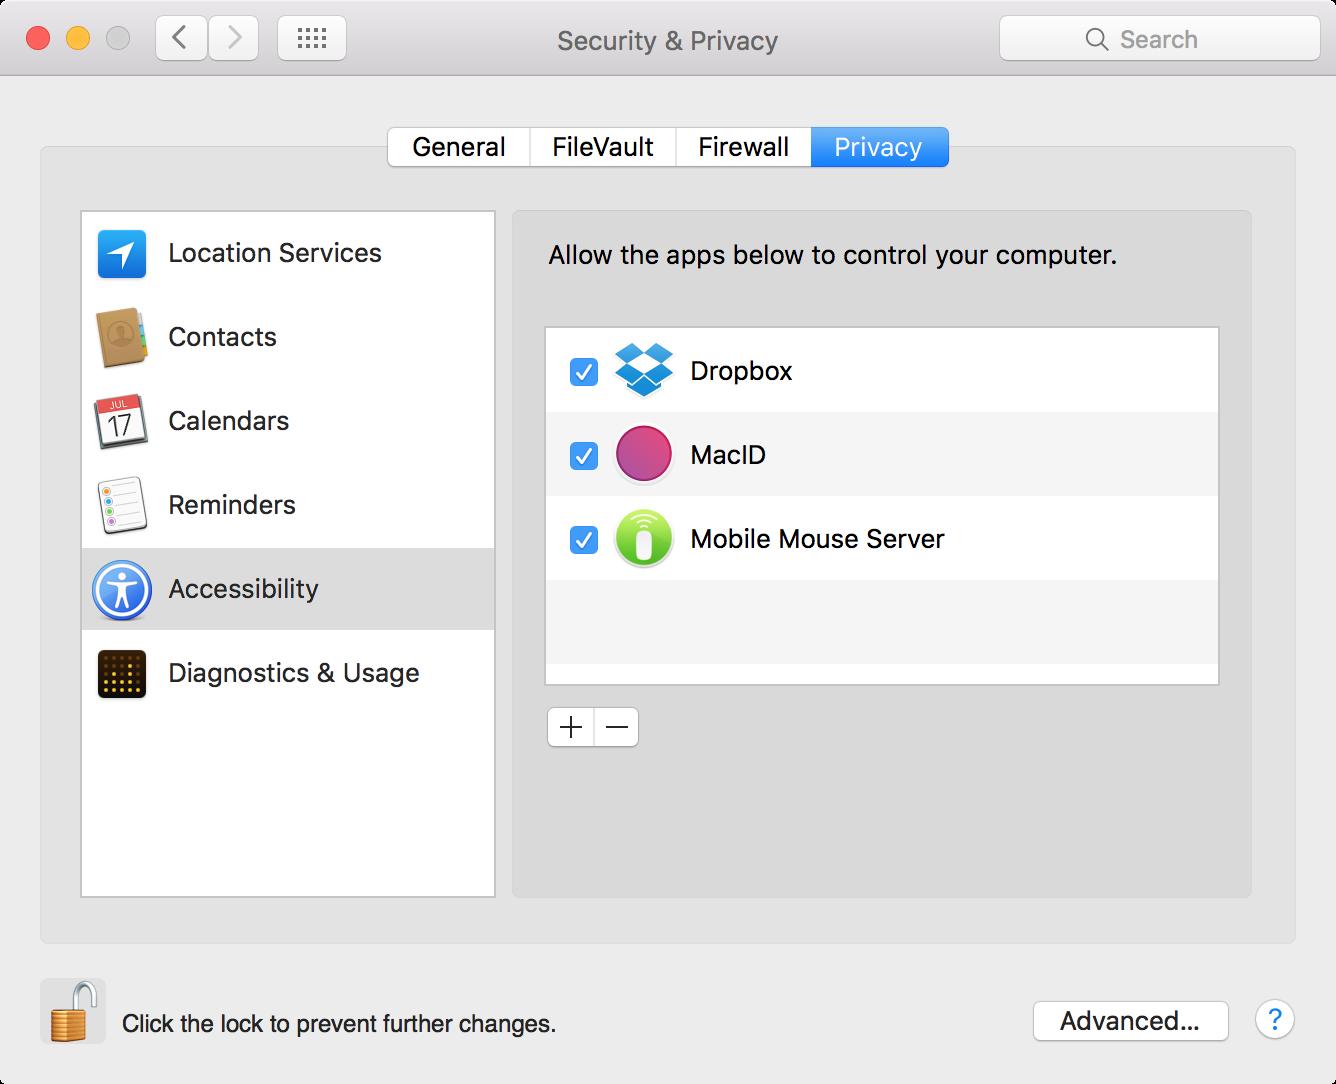 Accesibilidad del servidor de mouse móvil